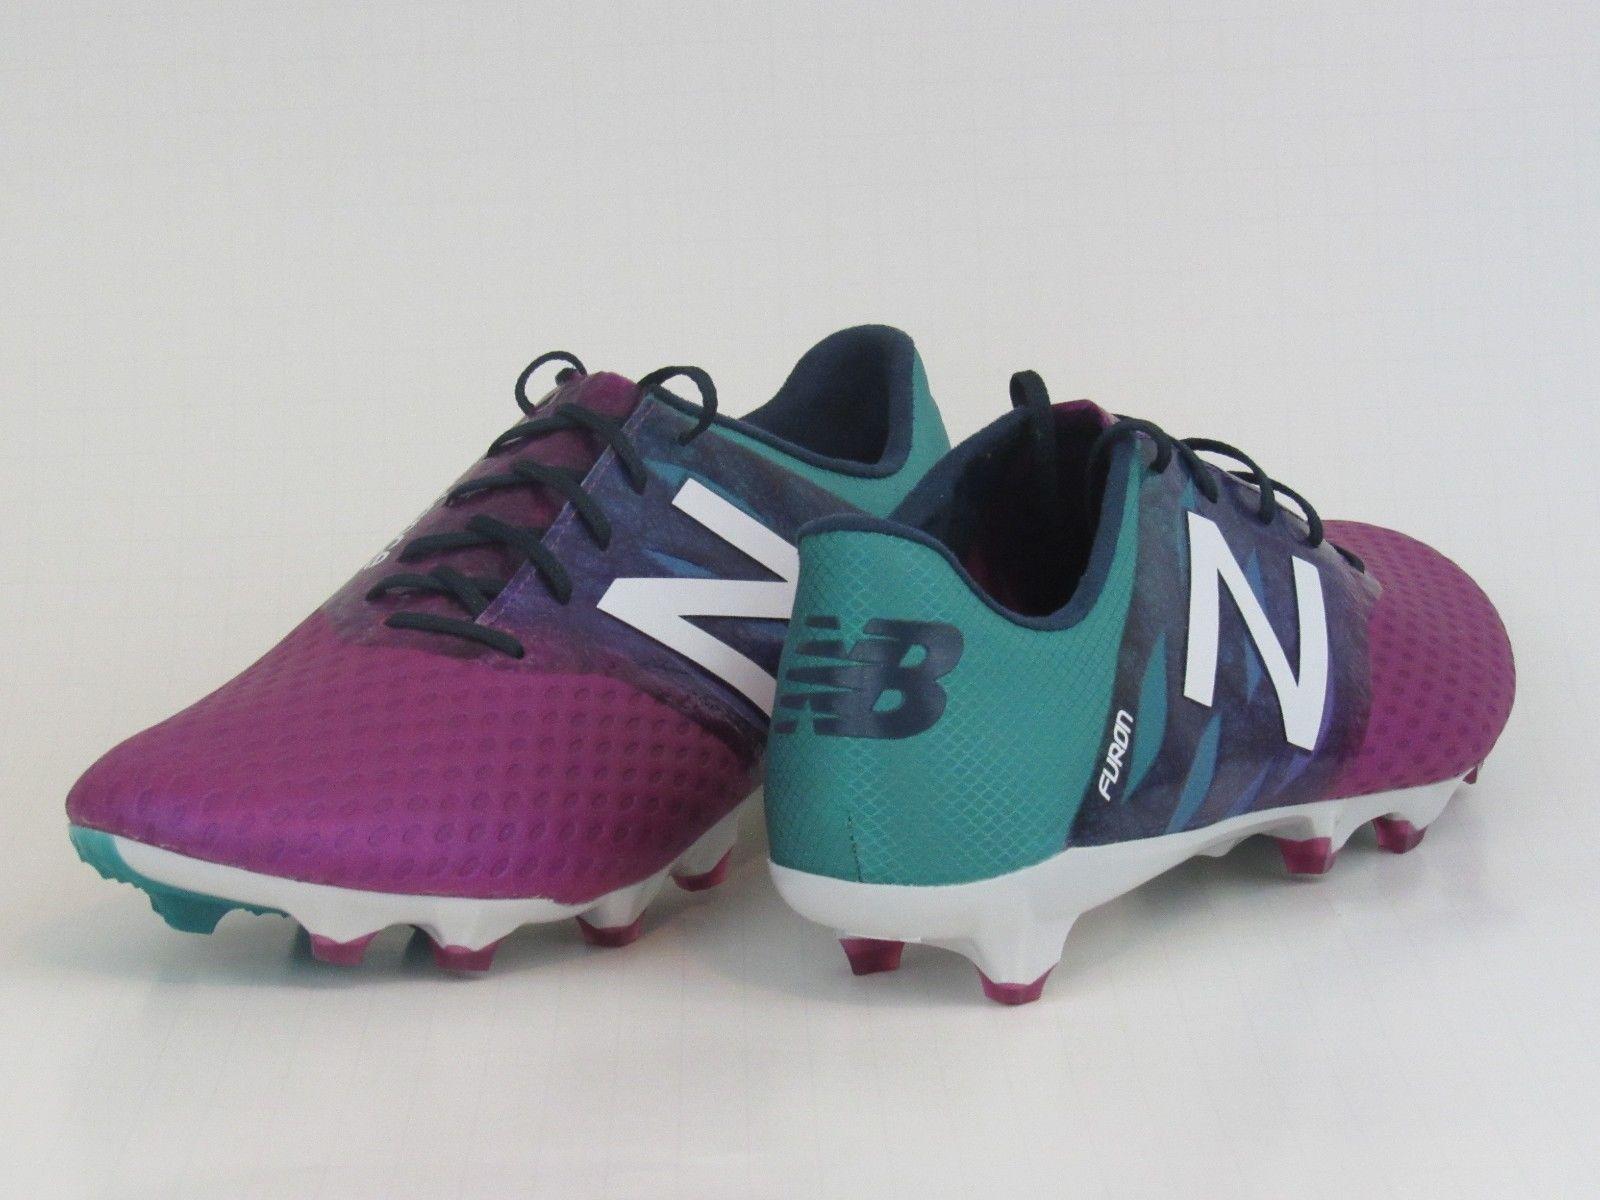 134ab3b53cd4a New Balance Furon Pro FG Mens Soccer Cleats shoes Purple/green : $180  Retail!